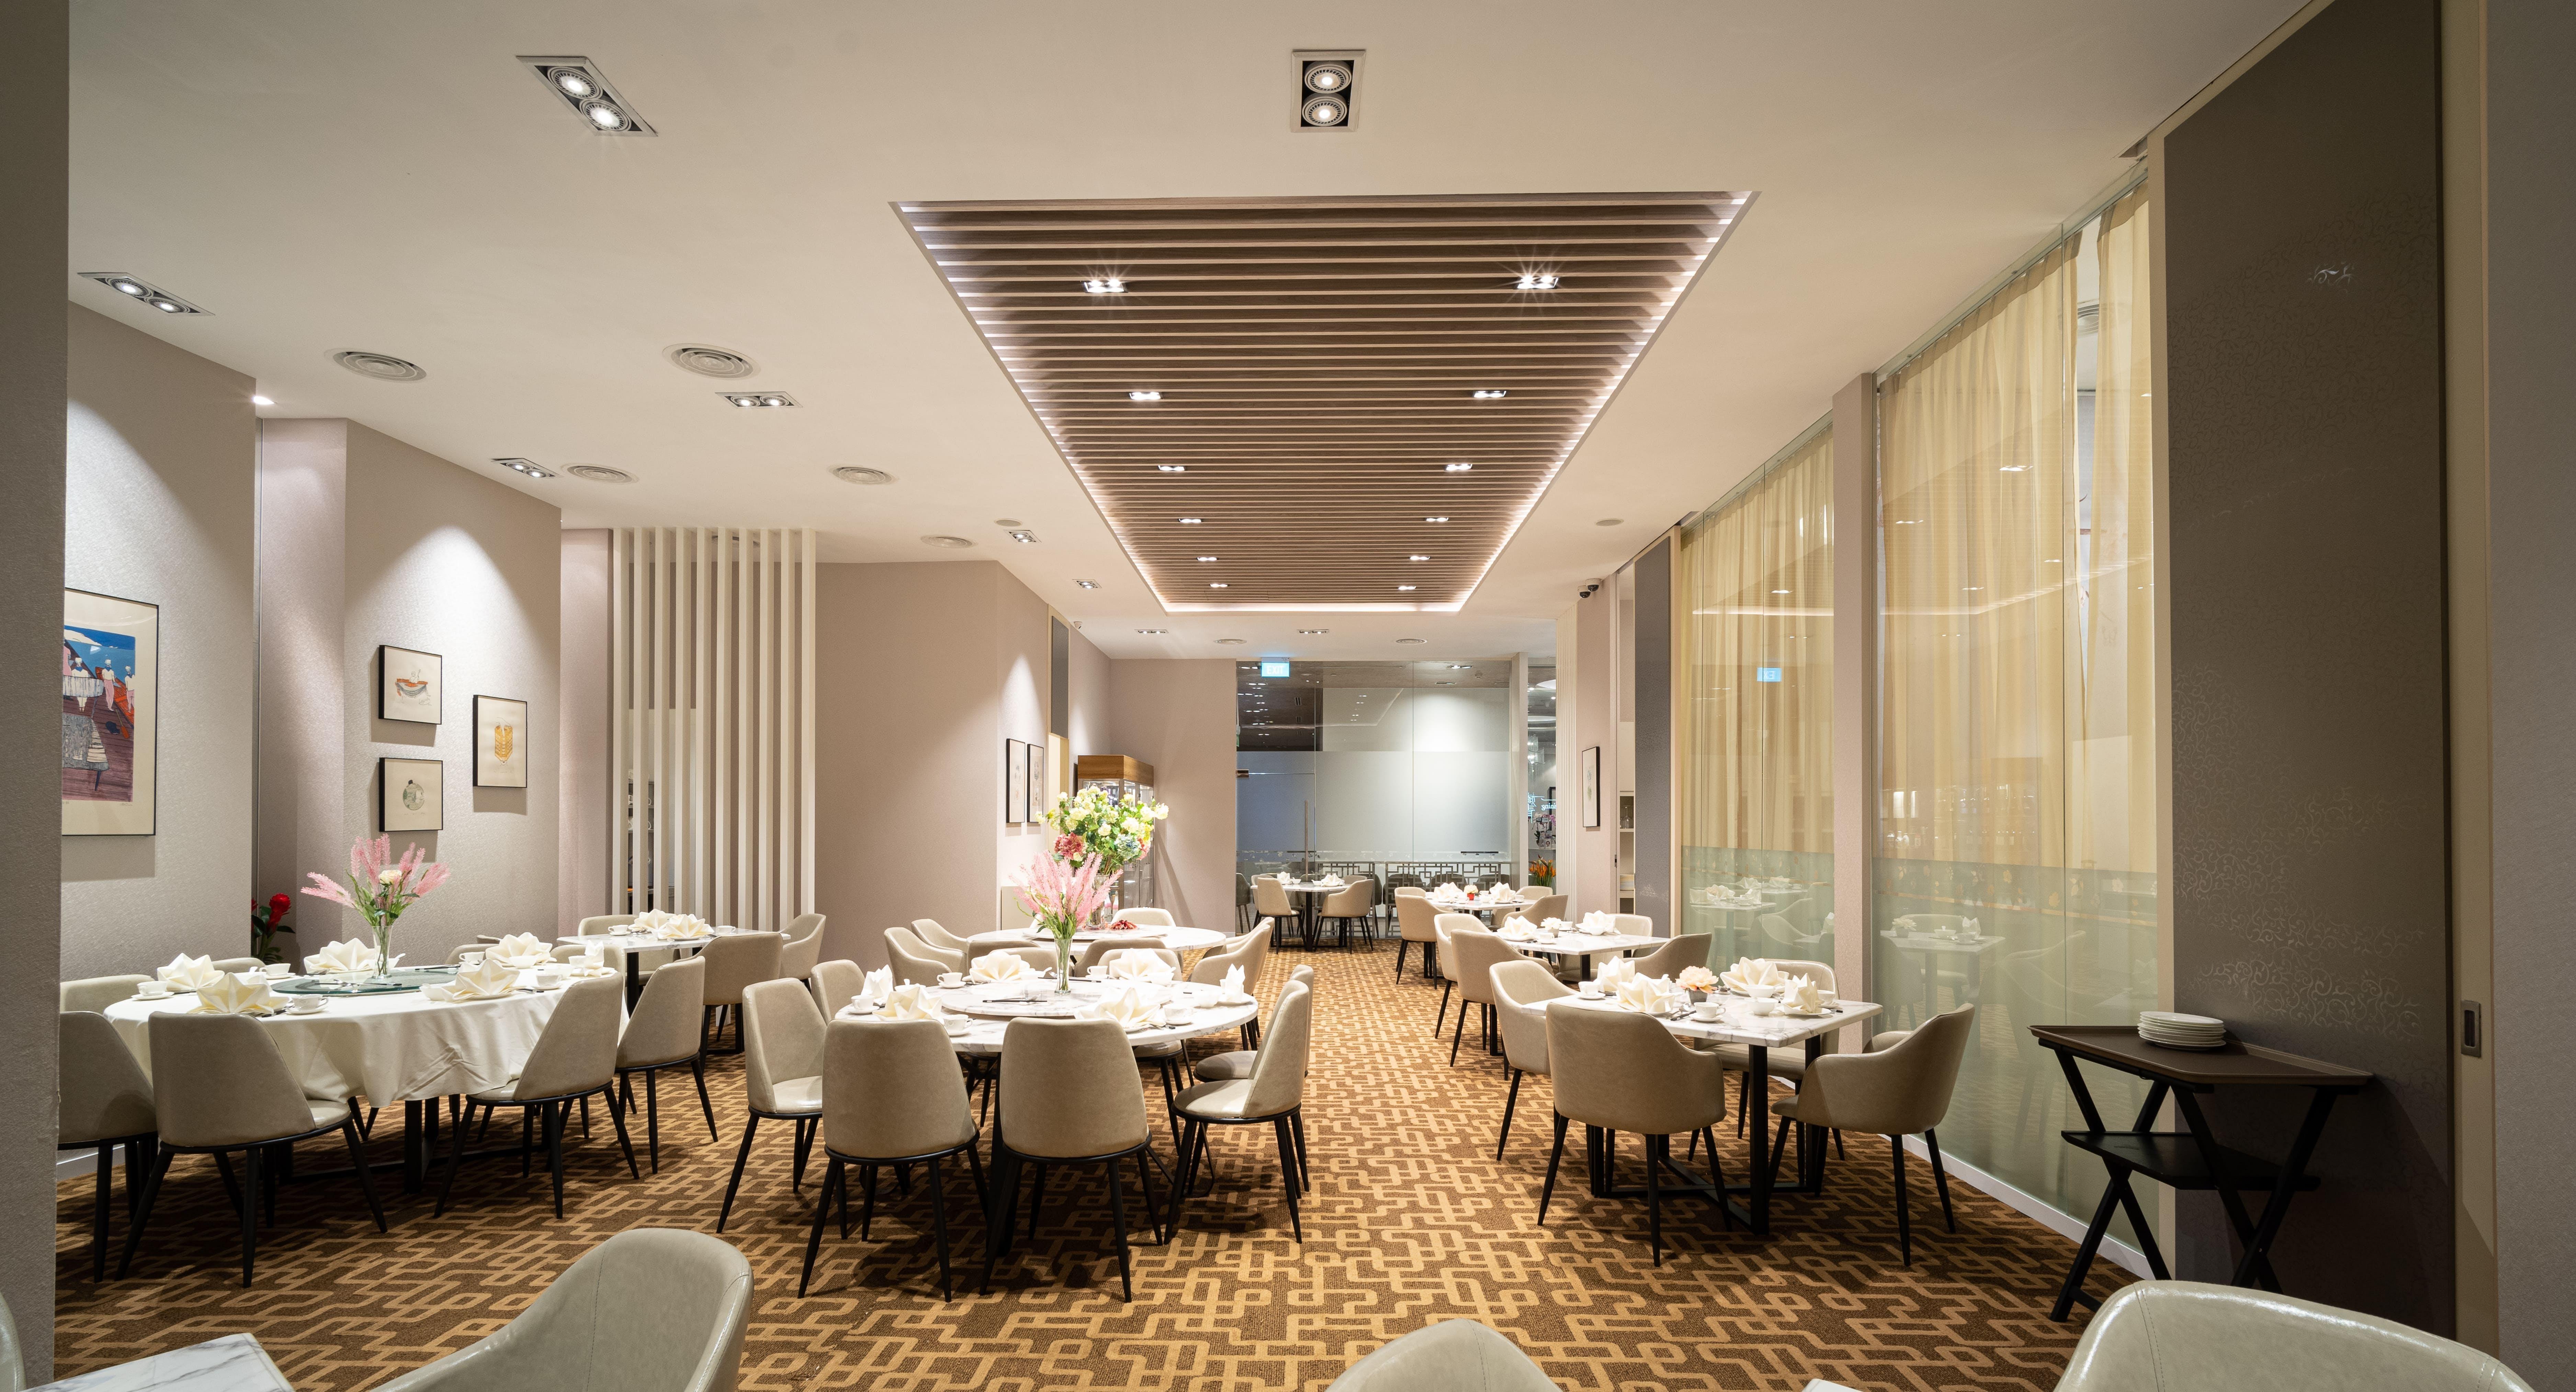 Yan's Dining Fine Shanghai Cuisine 嬿青私房菜 Singapore image 2